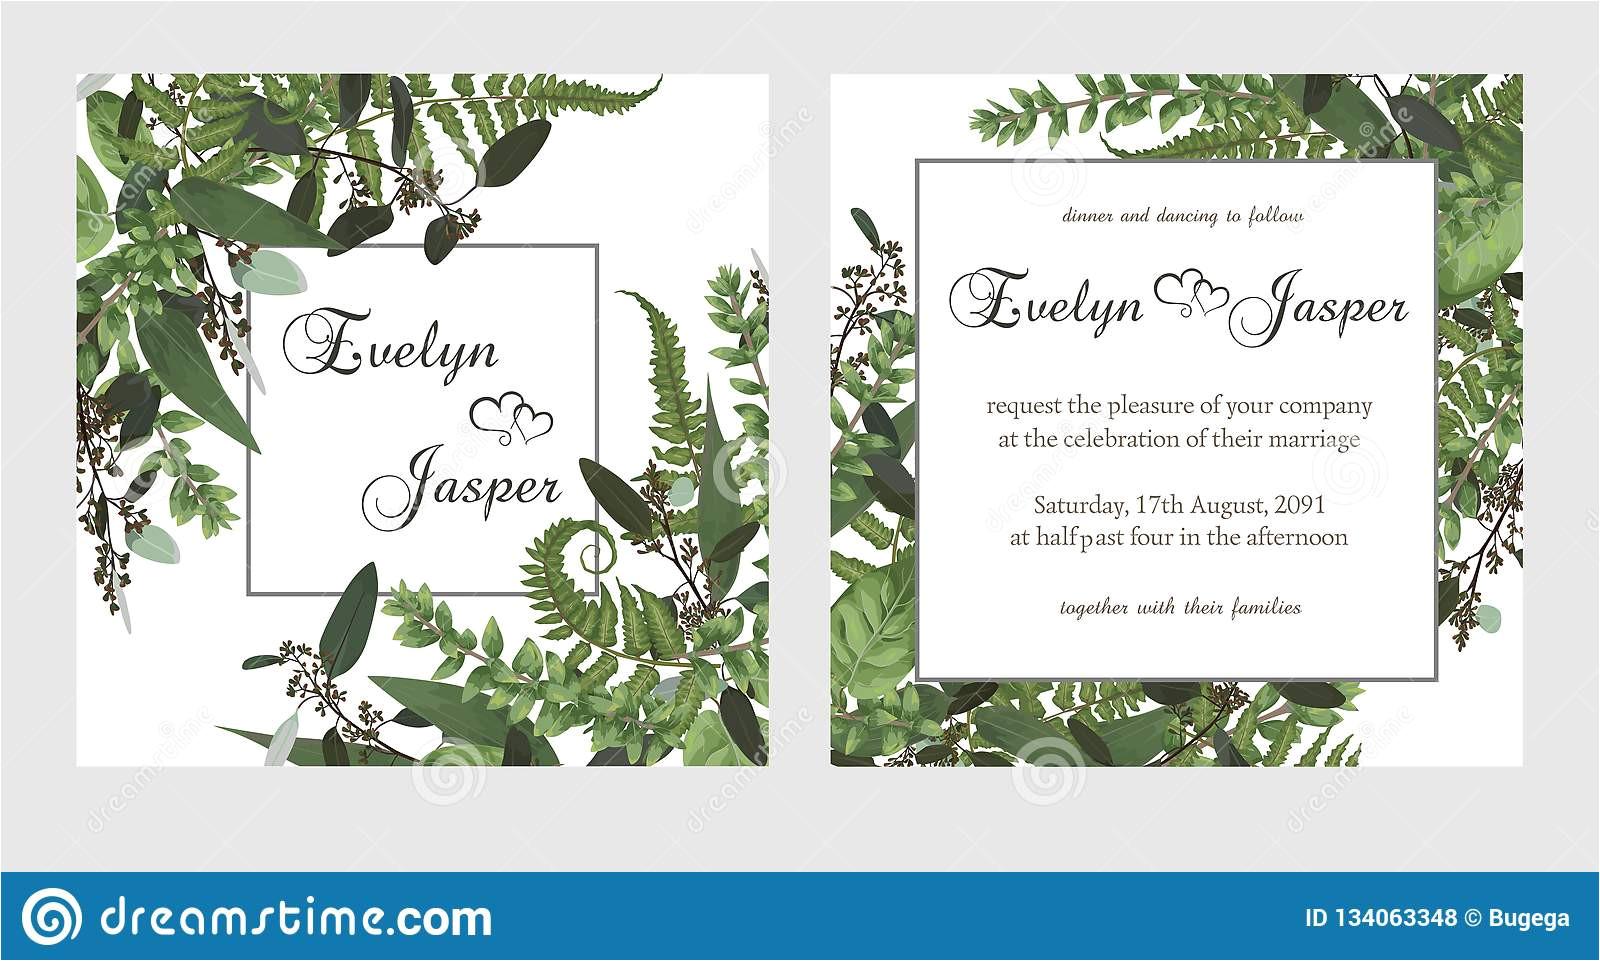 set wedding invitation greeting card save date banner vintage square frame green fern leaf boxwo od eucalyptus sprigs 134063348 jpg